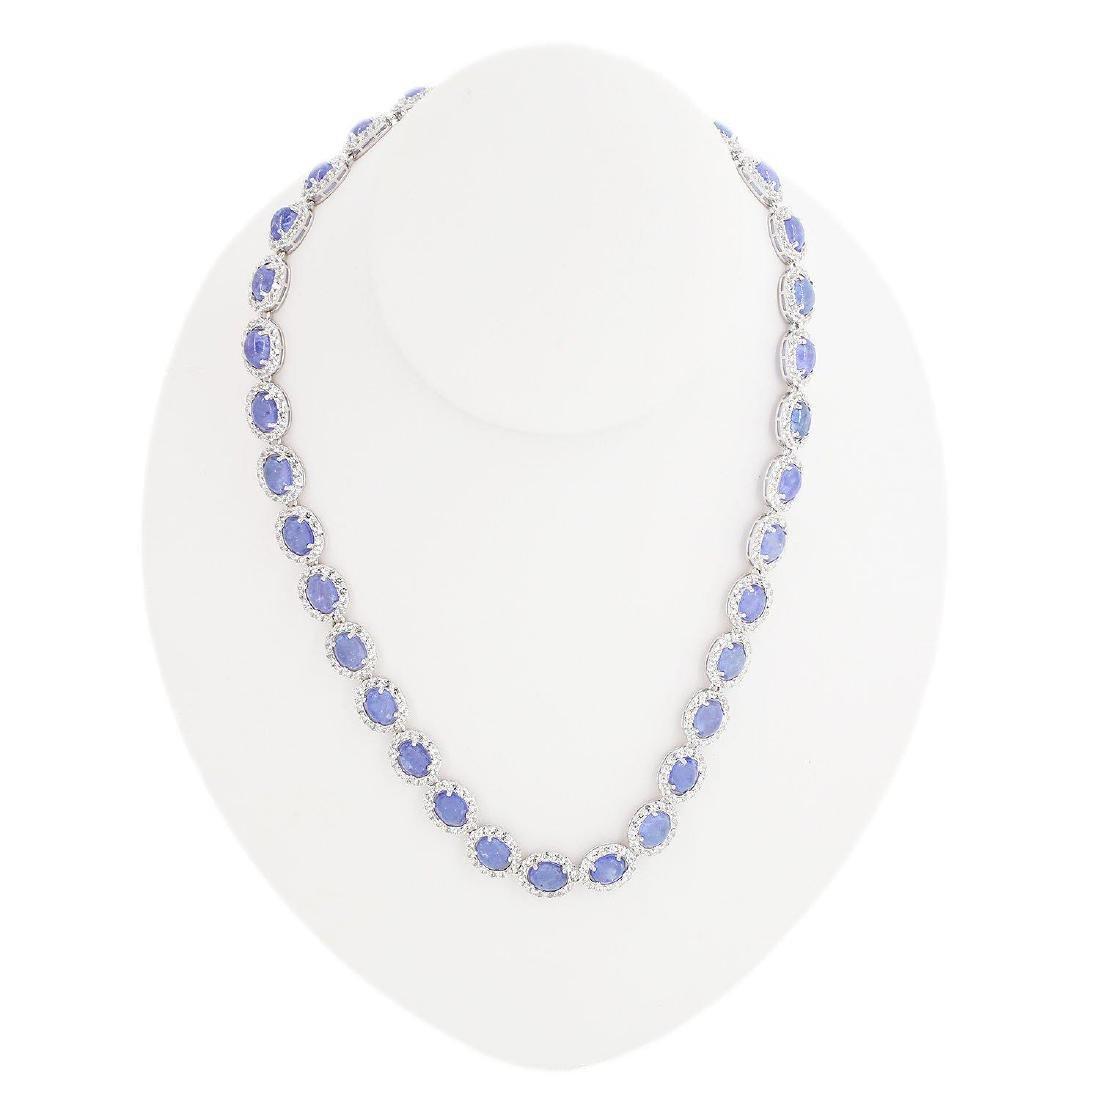 46.00ctw Tanzanite 13.78ctw White Topaz Necklace